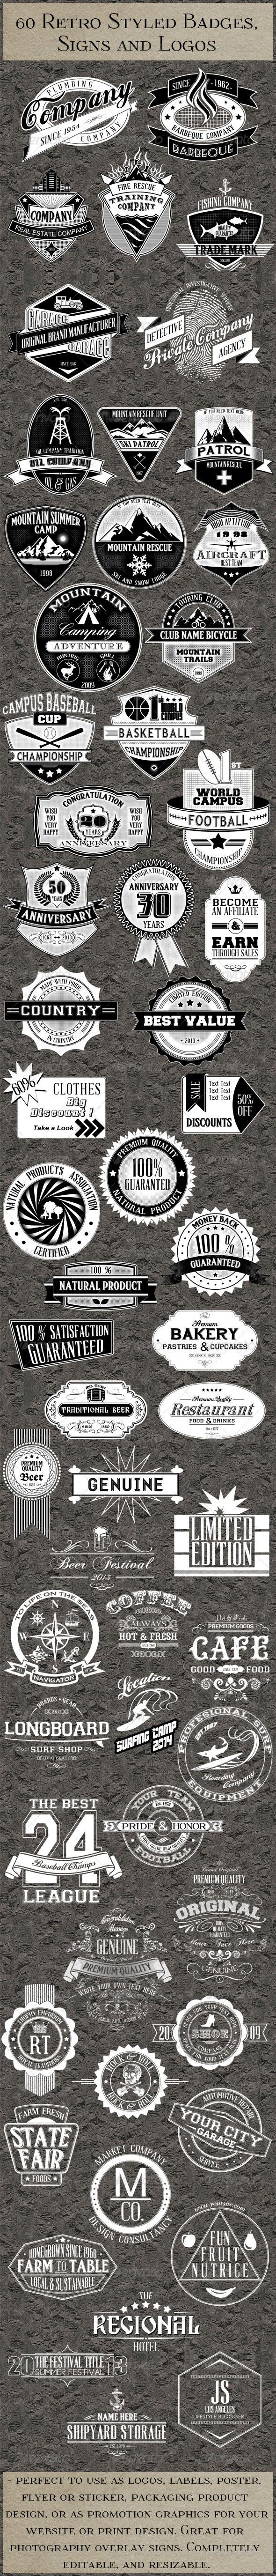 60 Retro Badges Logos Insignias - Badges & Stickers Web Elements